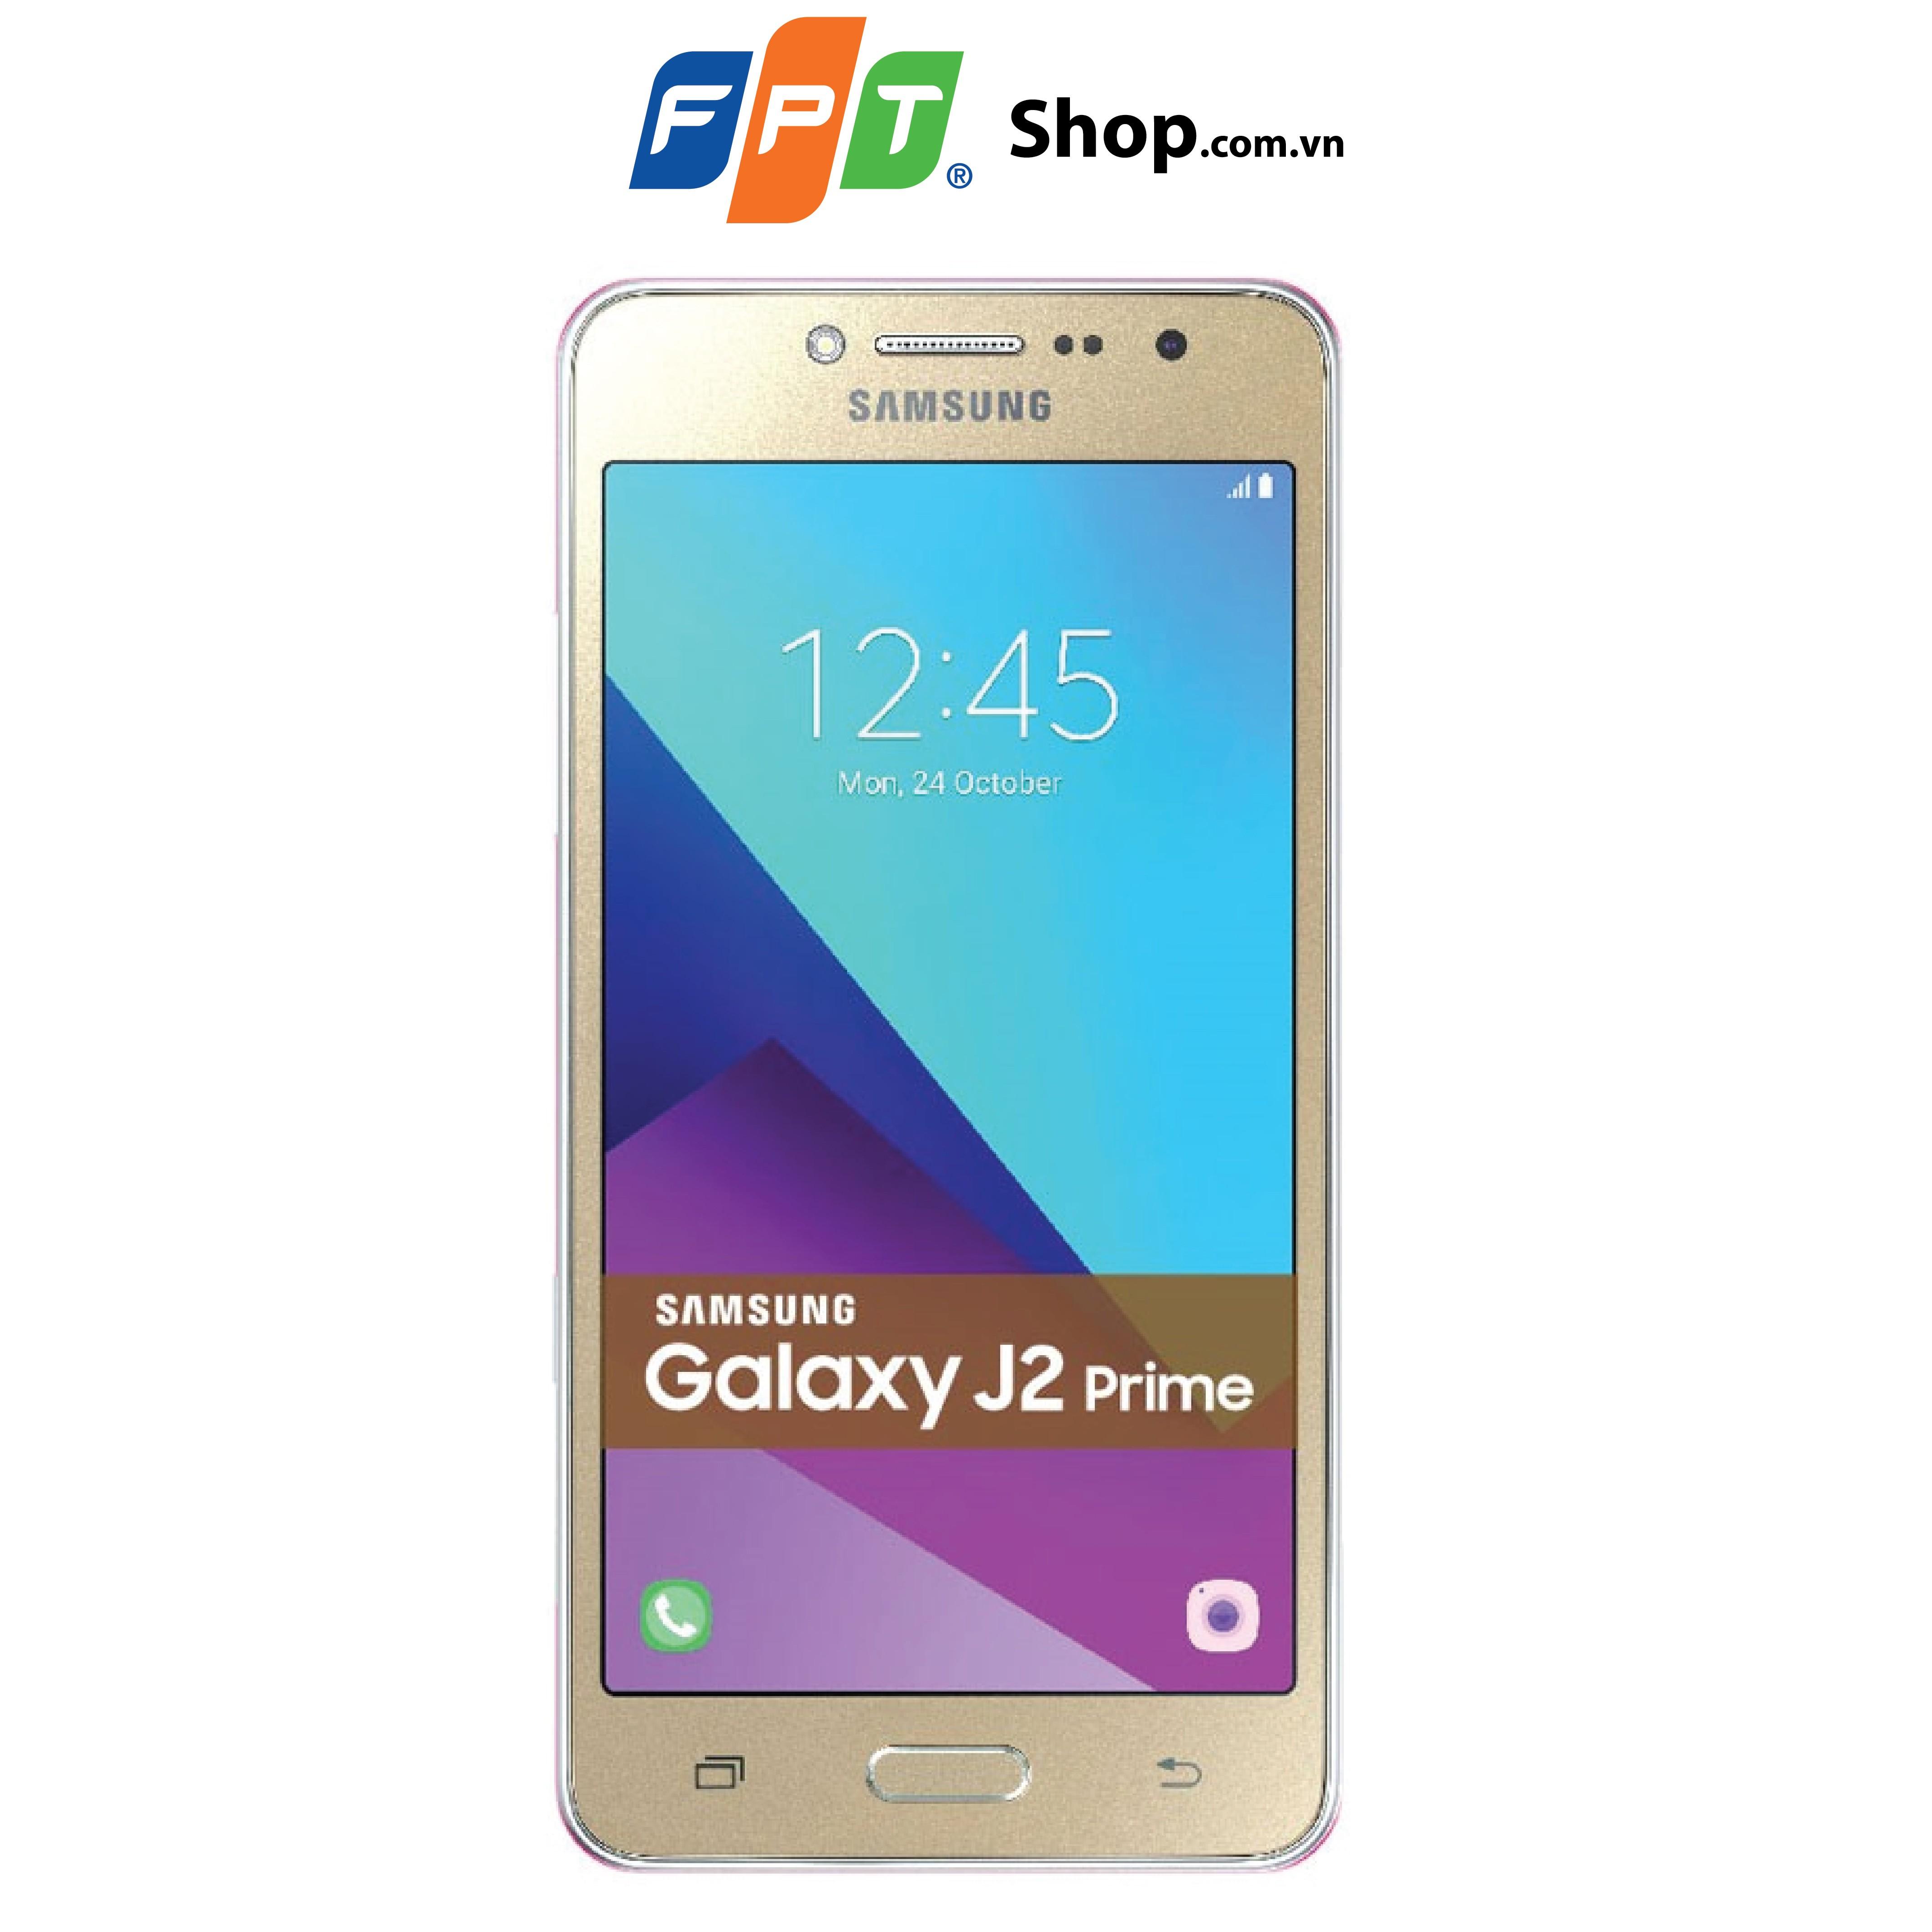 Samsung Galaxy Grand Prime Dep Chinh Hang Chat Luong Gia Re Hap Dan